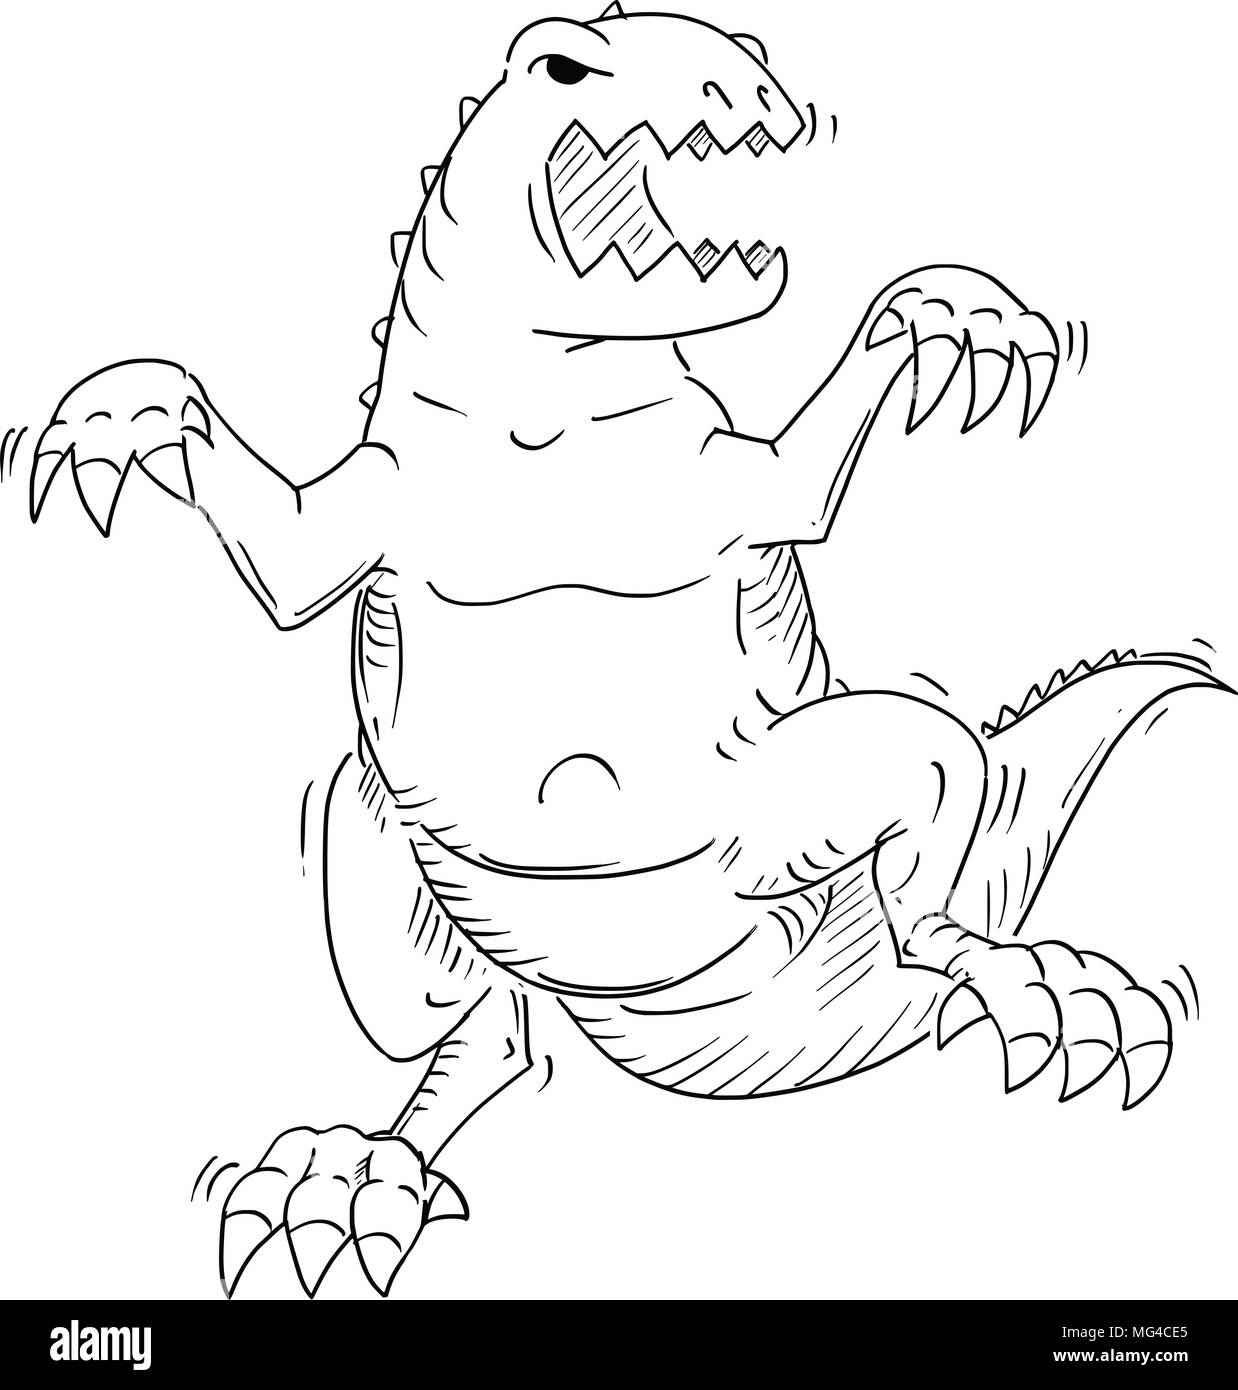 Cartoon of Monster Tyrannosaur or Dinosaur Godzilla Like Creature - Stock Image